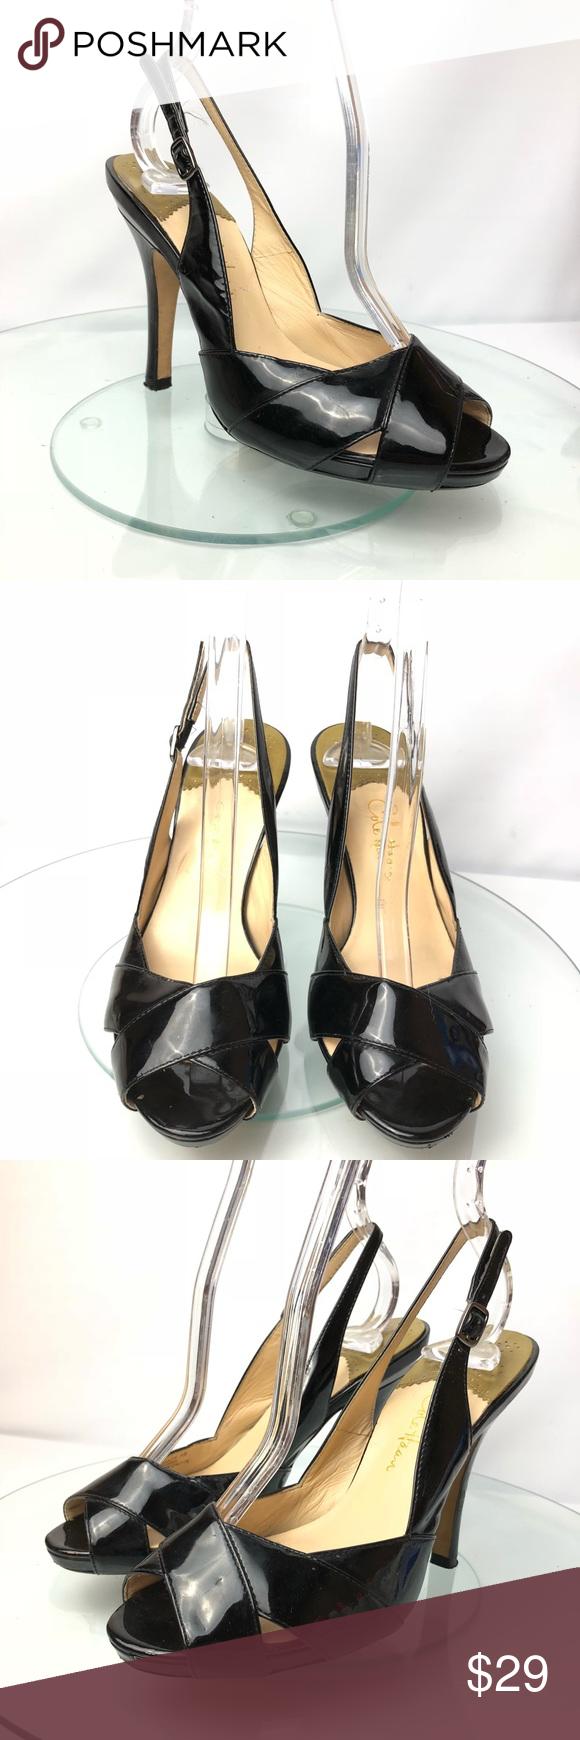 "b44b651aeeef Cole Haan Black Patent Leather Peep Toe Heels Sz 5 Cole Haan Black Patent  Leather Peep Toe Slingback Pumps Heels Women s Size 5 Heel height  4"" Cole  Haan ..."